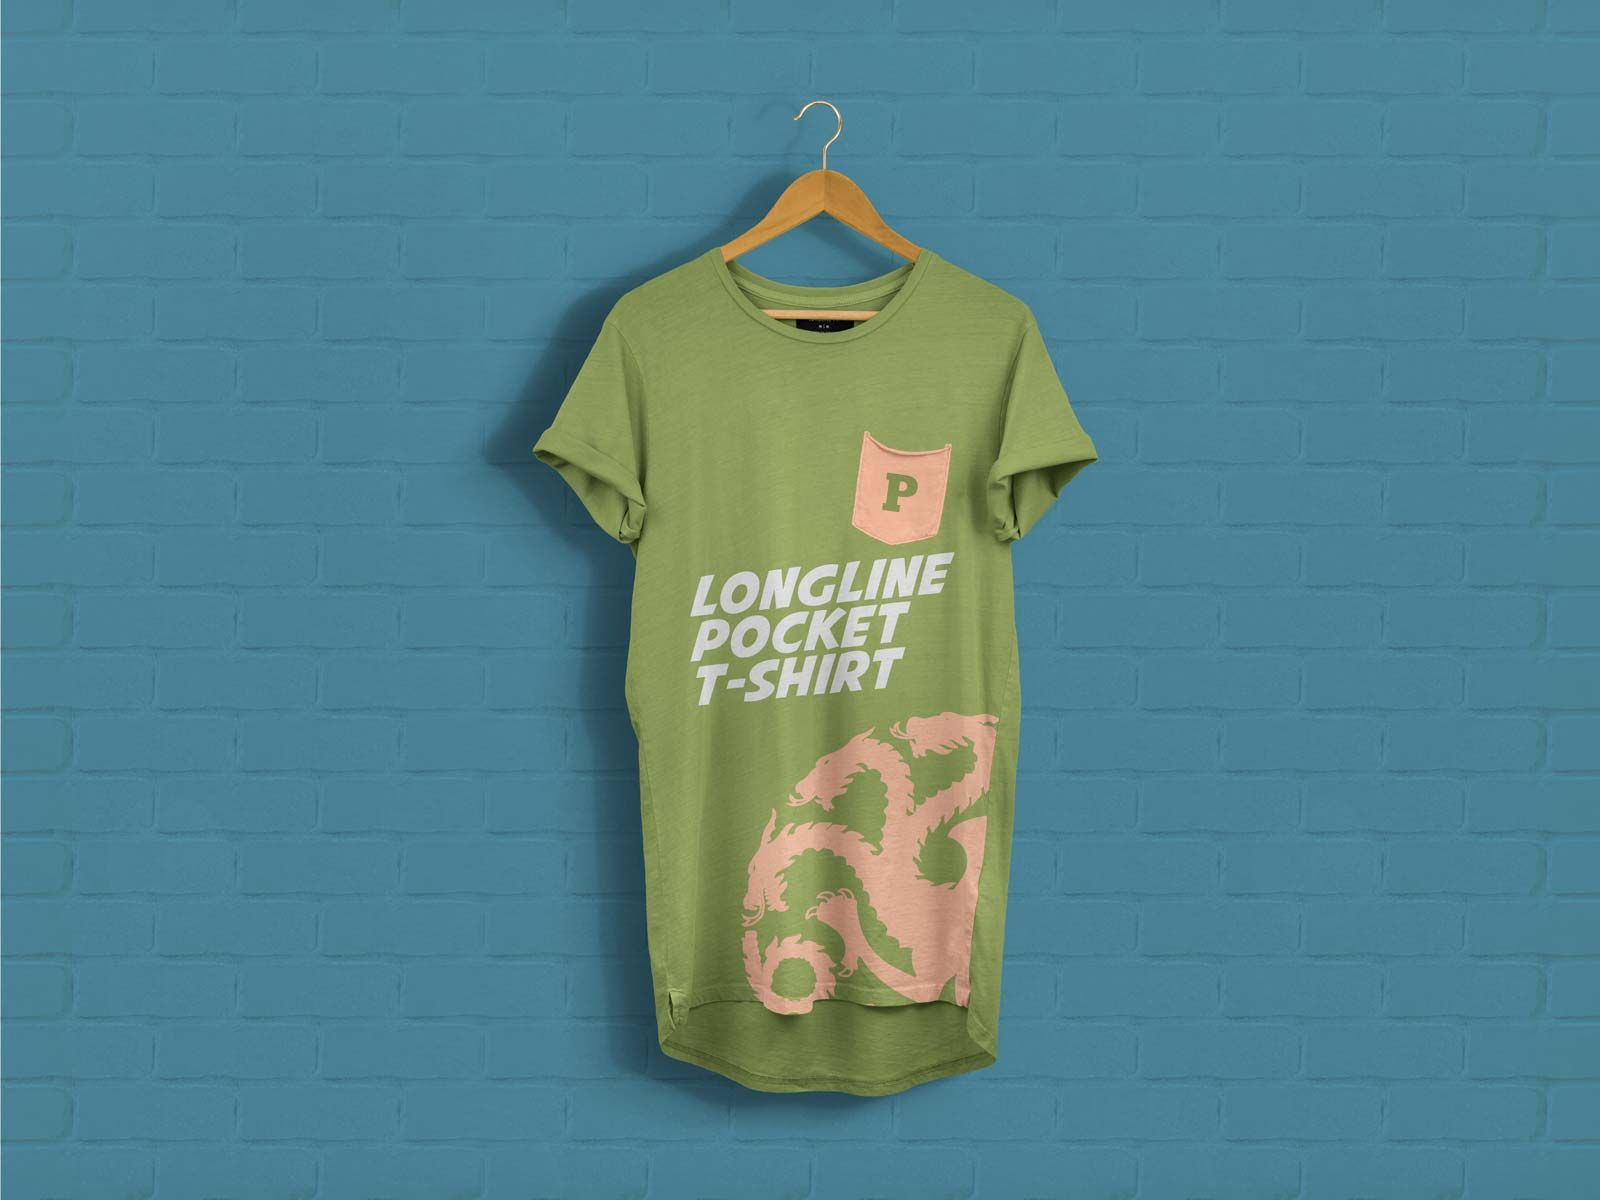 Download Short Sleeves Longline Pocket T Shirt Mockup Psd Shirt Mockup Pocket Tshirt Tshirt Mockup